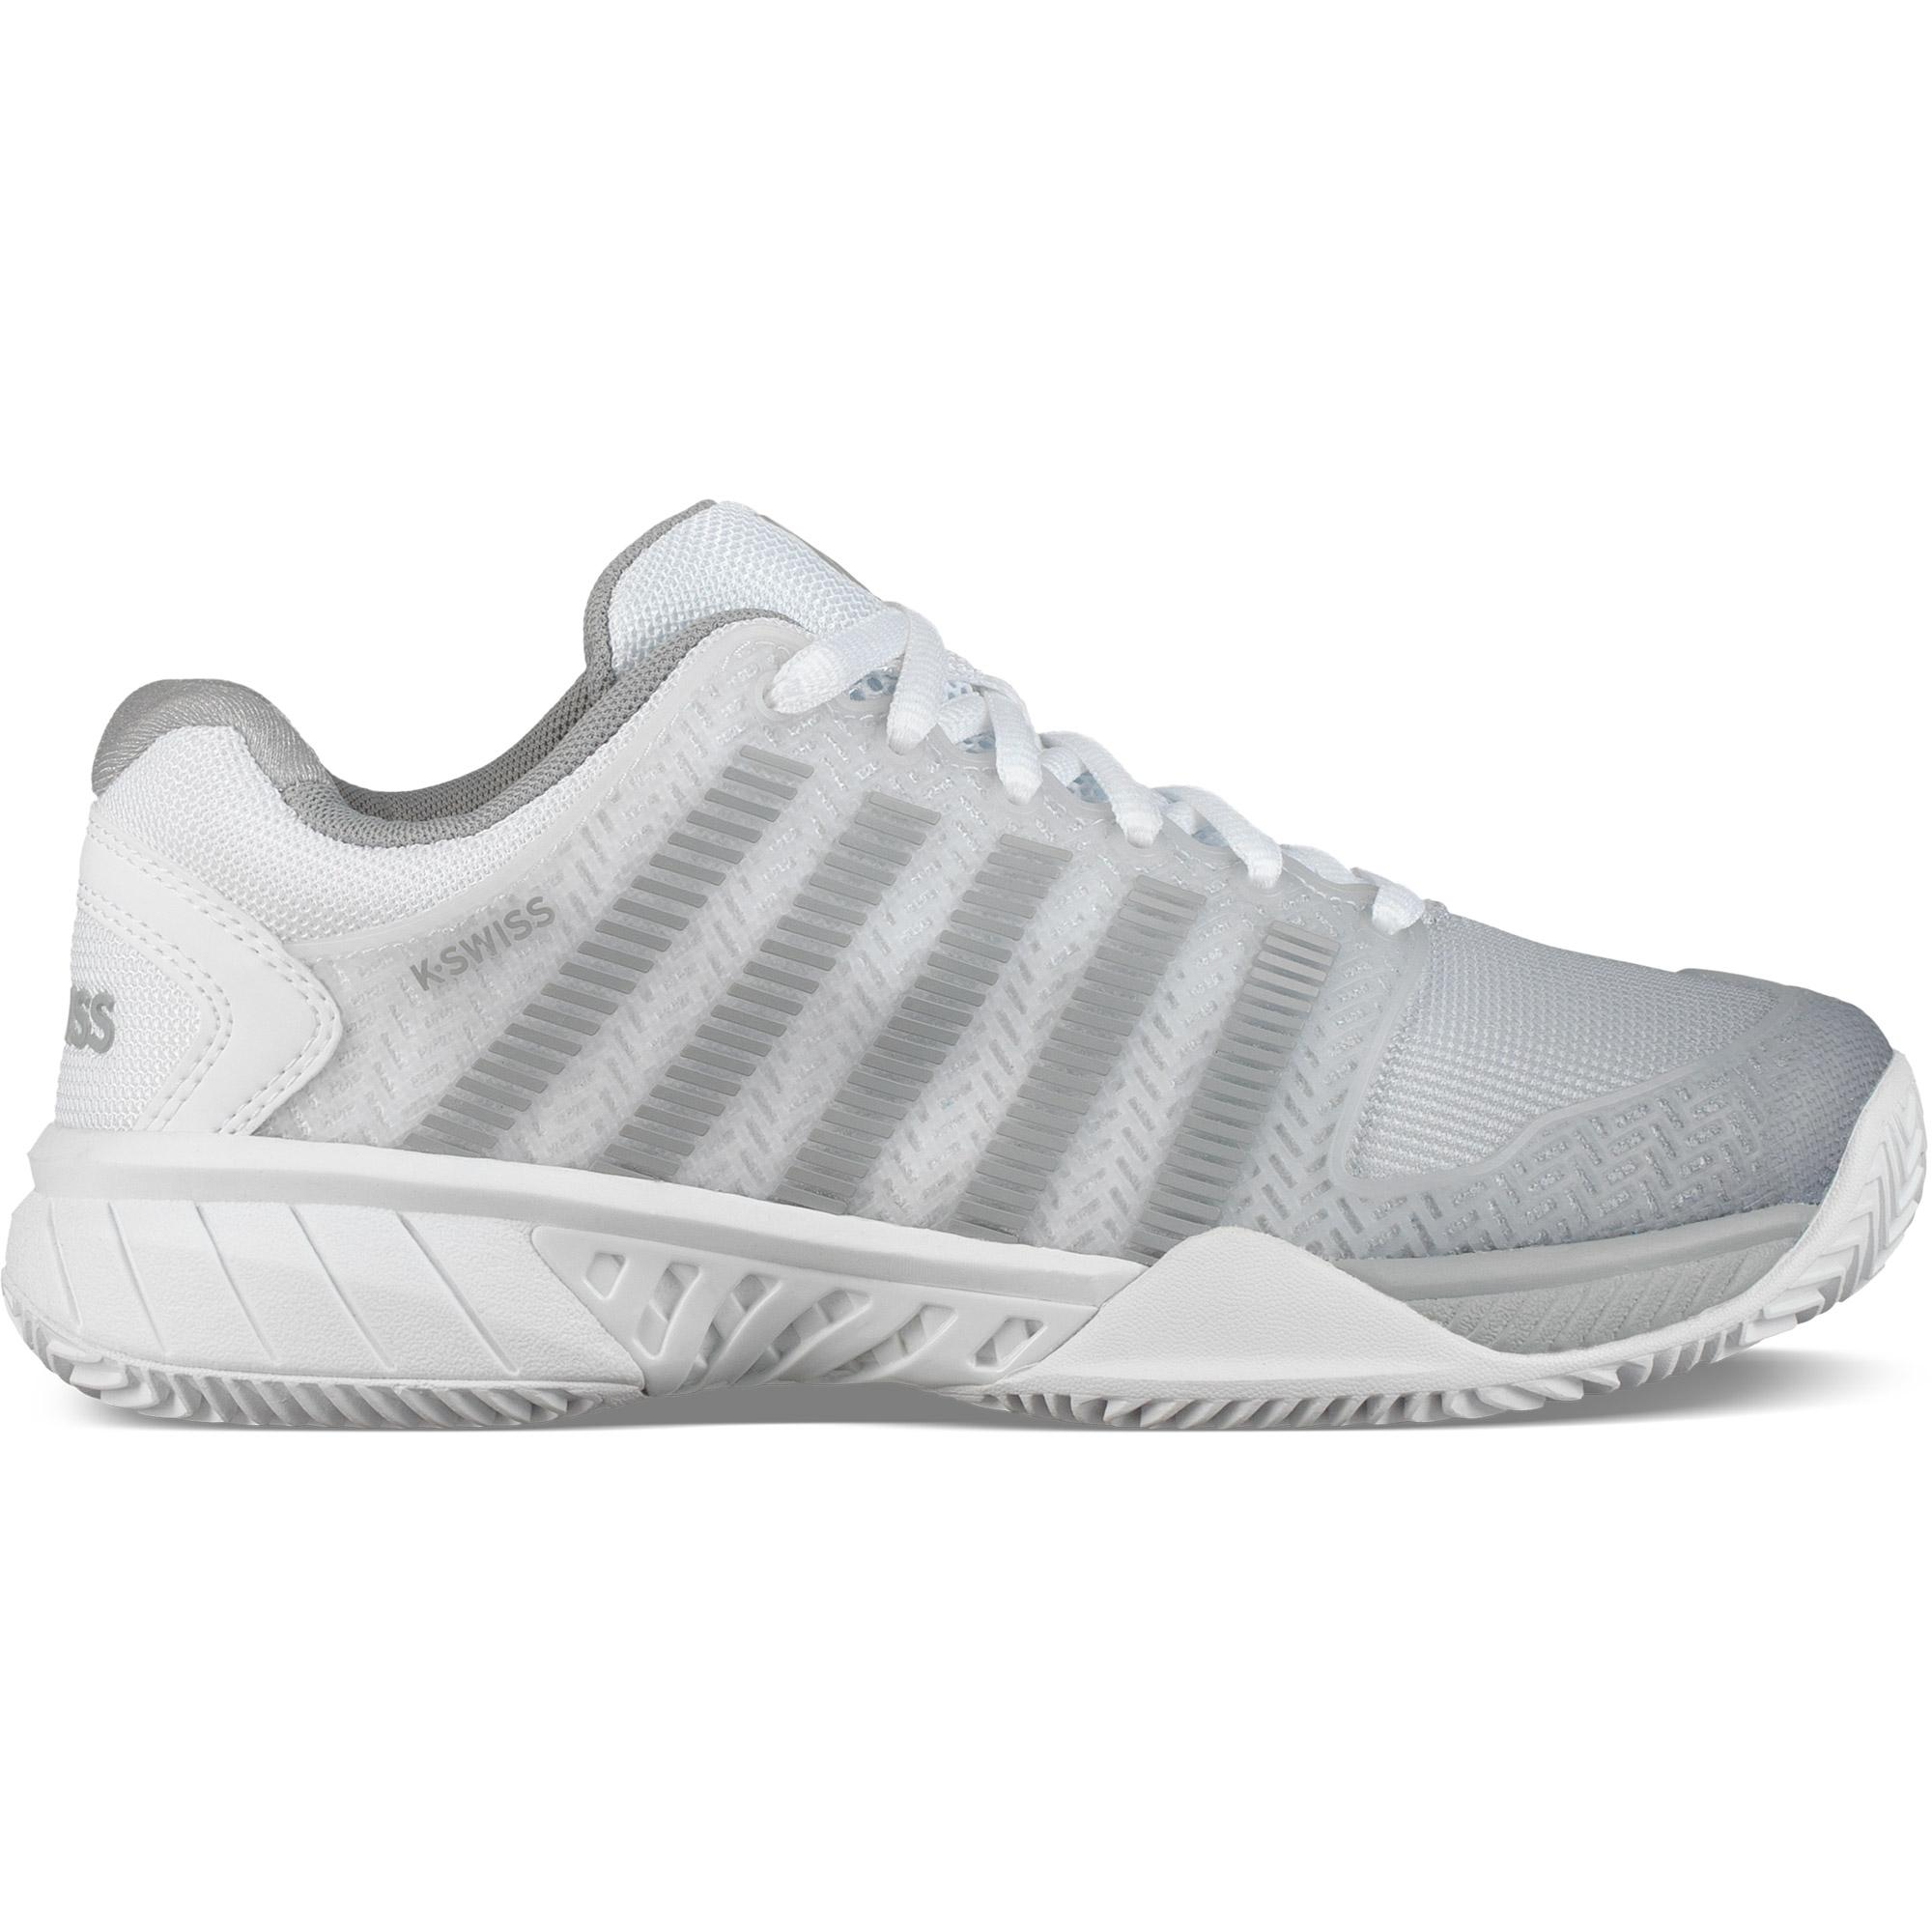 bd8ee317acfe4 K-Swiss Womens Hypercourt Express HB Tennis Shoes - White/Highrise